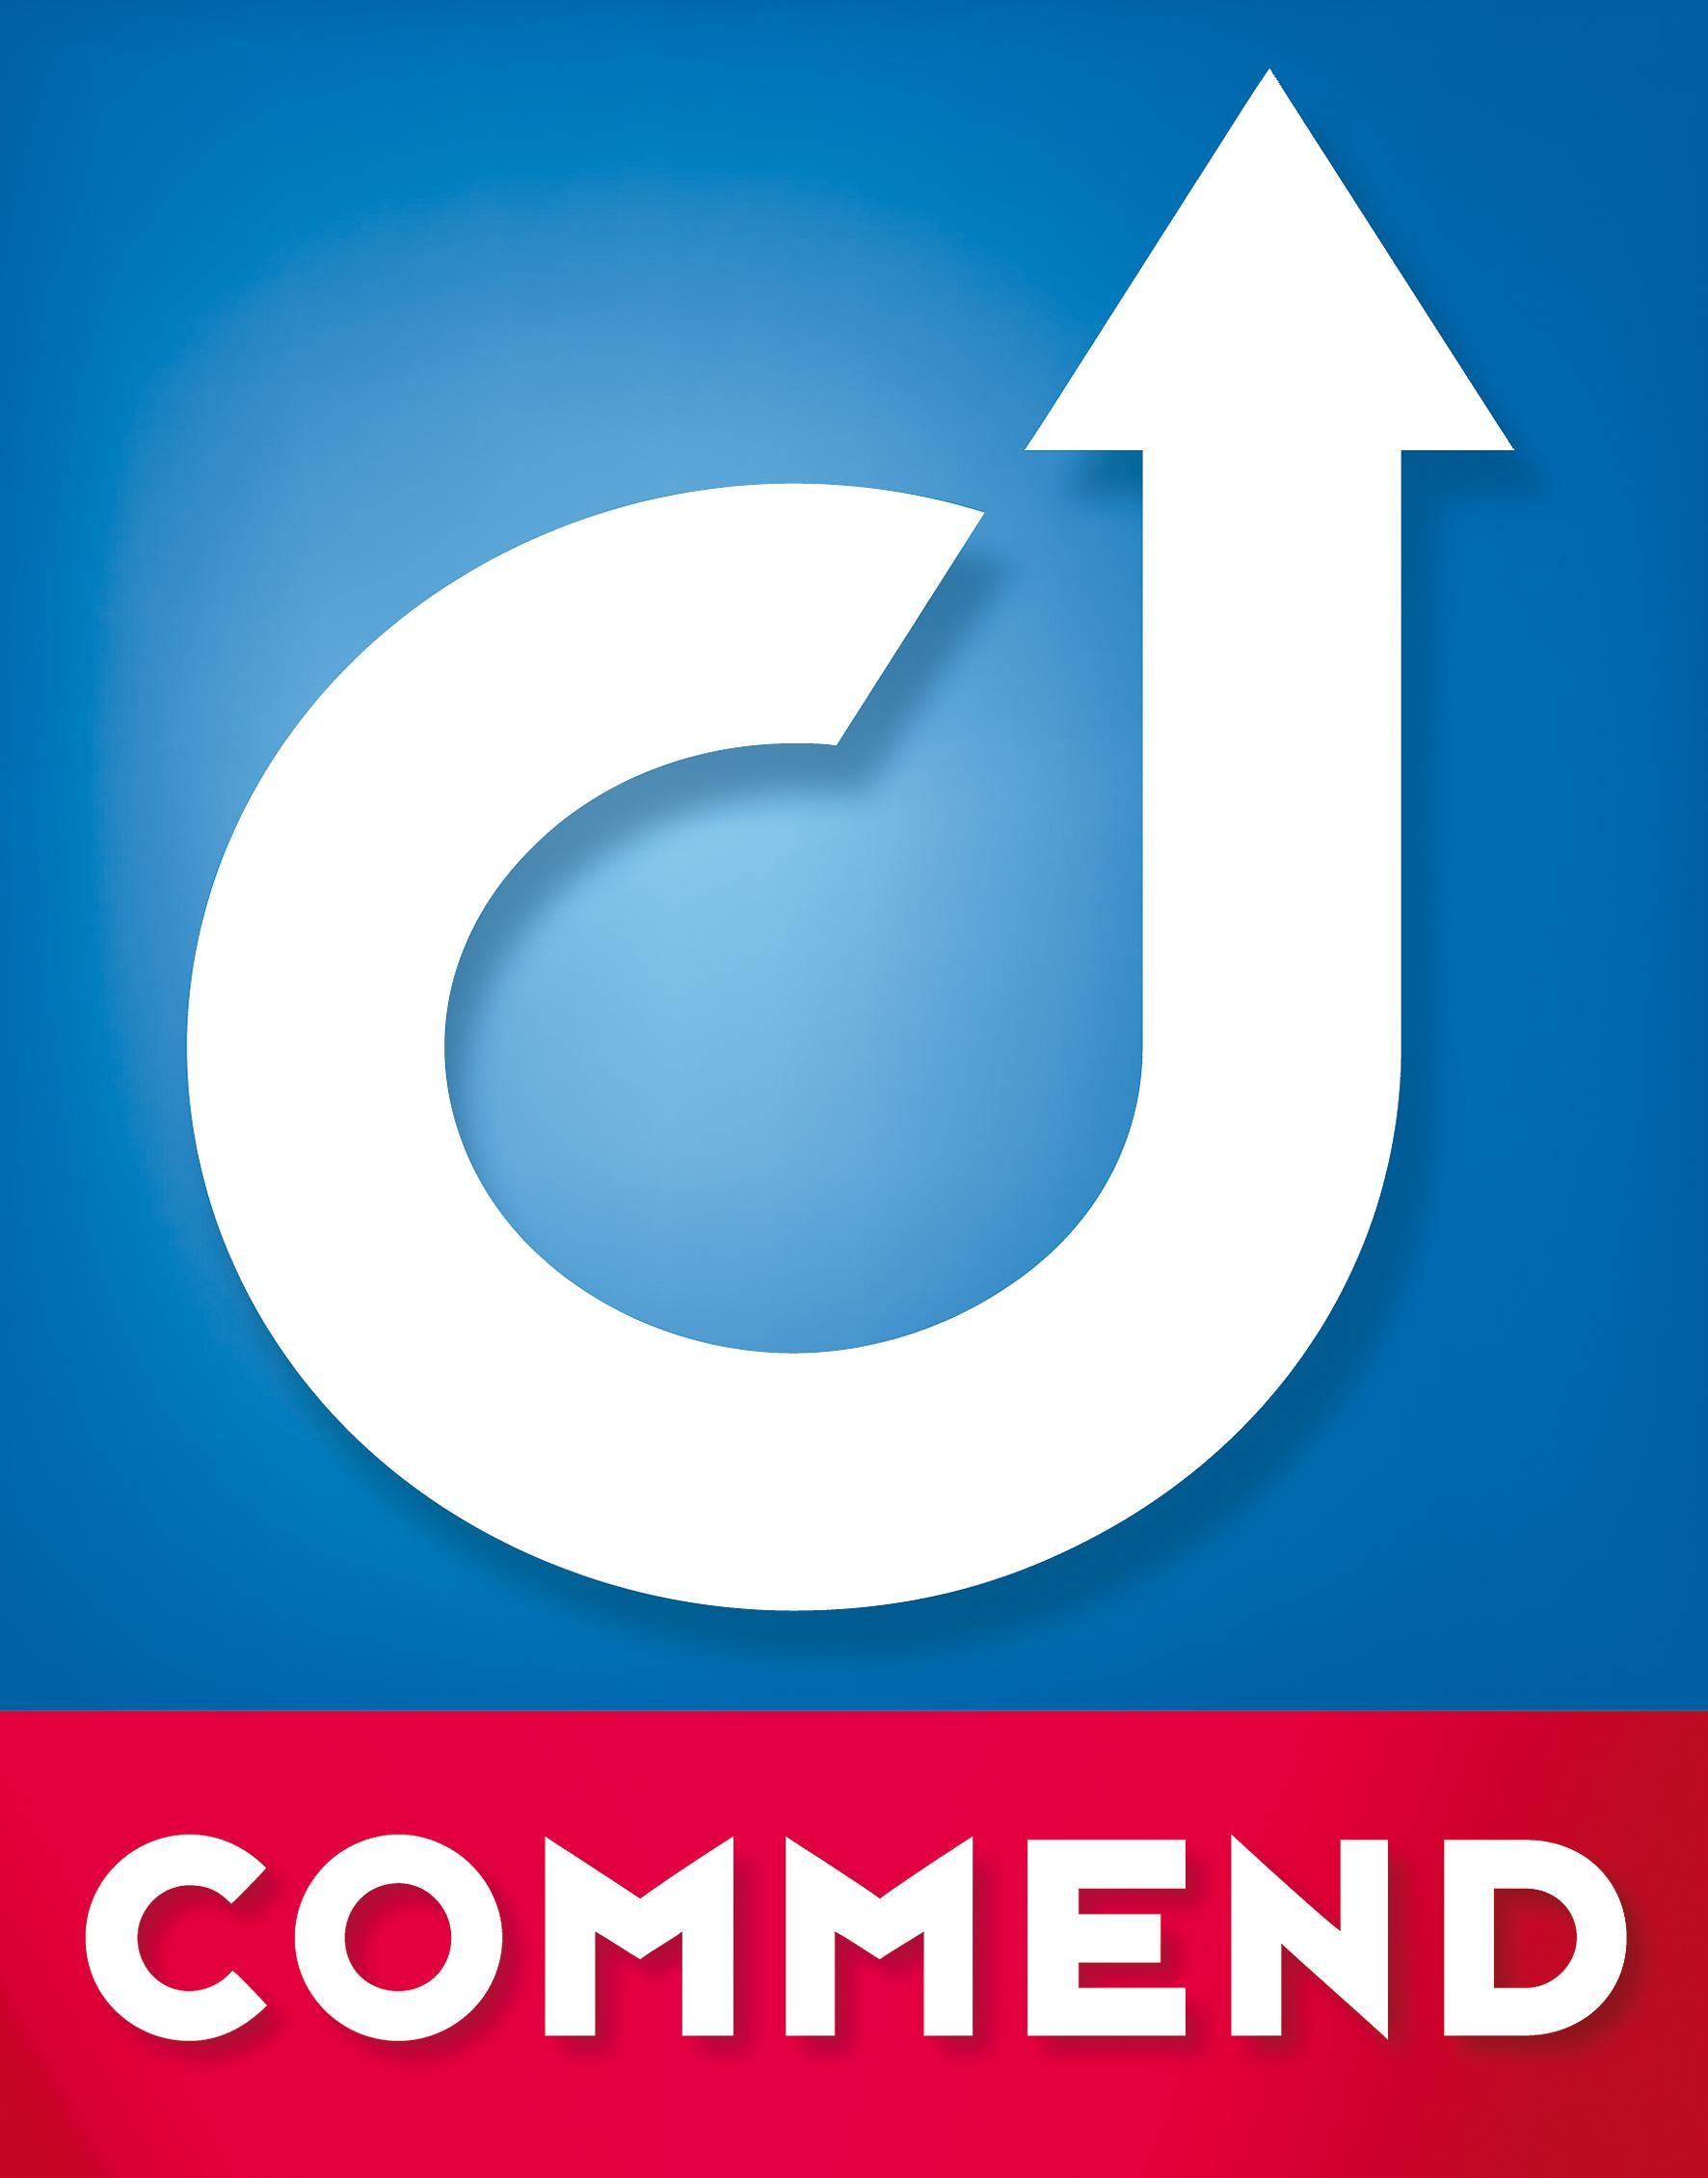 Logo-Commend-rgb-150x191mm-V10